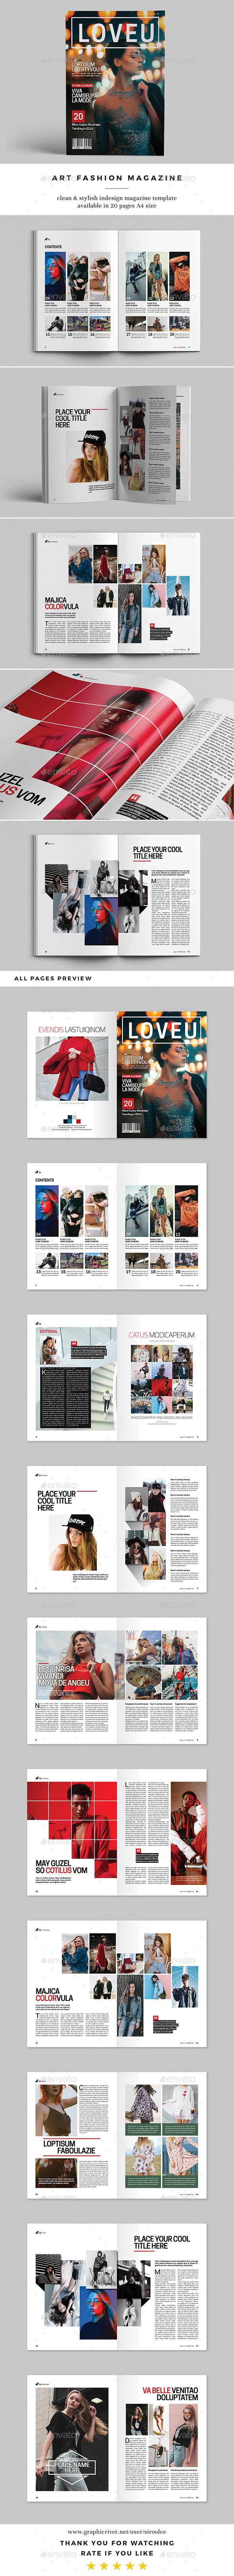 Art Fashion Magazine - Magazines Print Templates